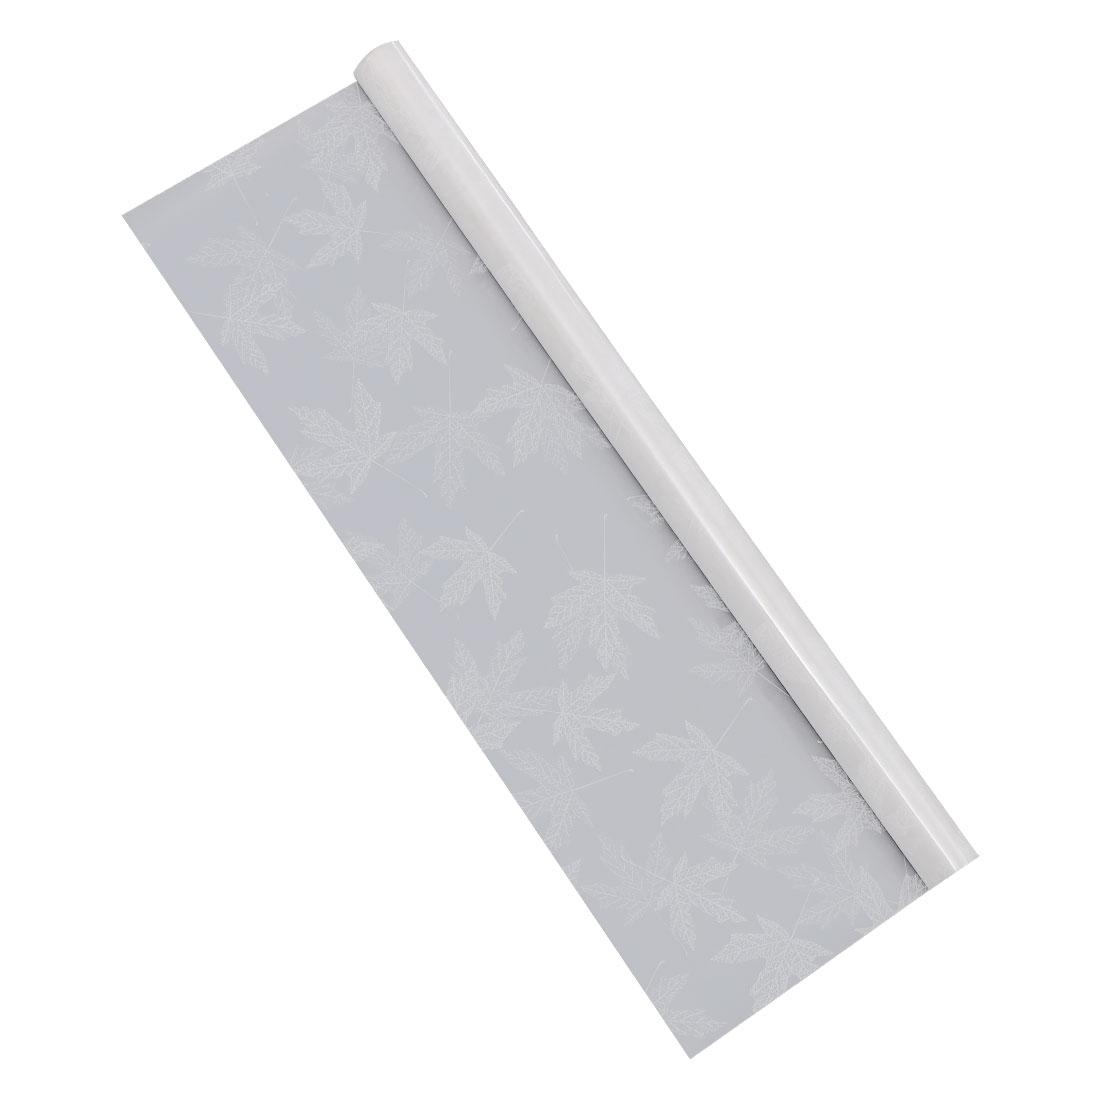 PVC 78.7 x 17.7 Inch Anti UV Window Film Sticker White Maple Leaf